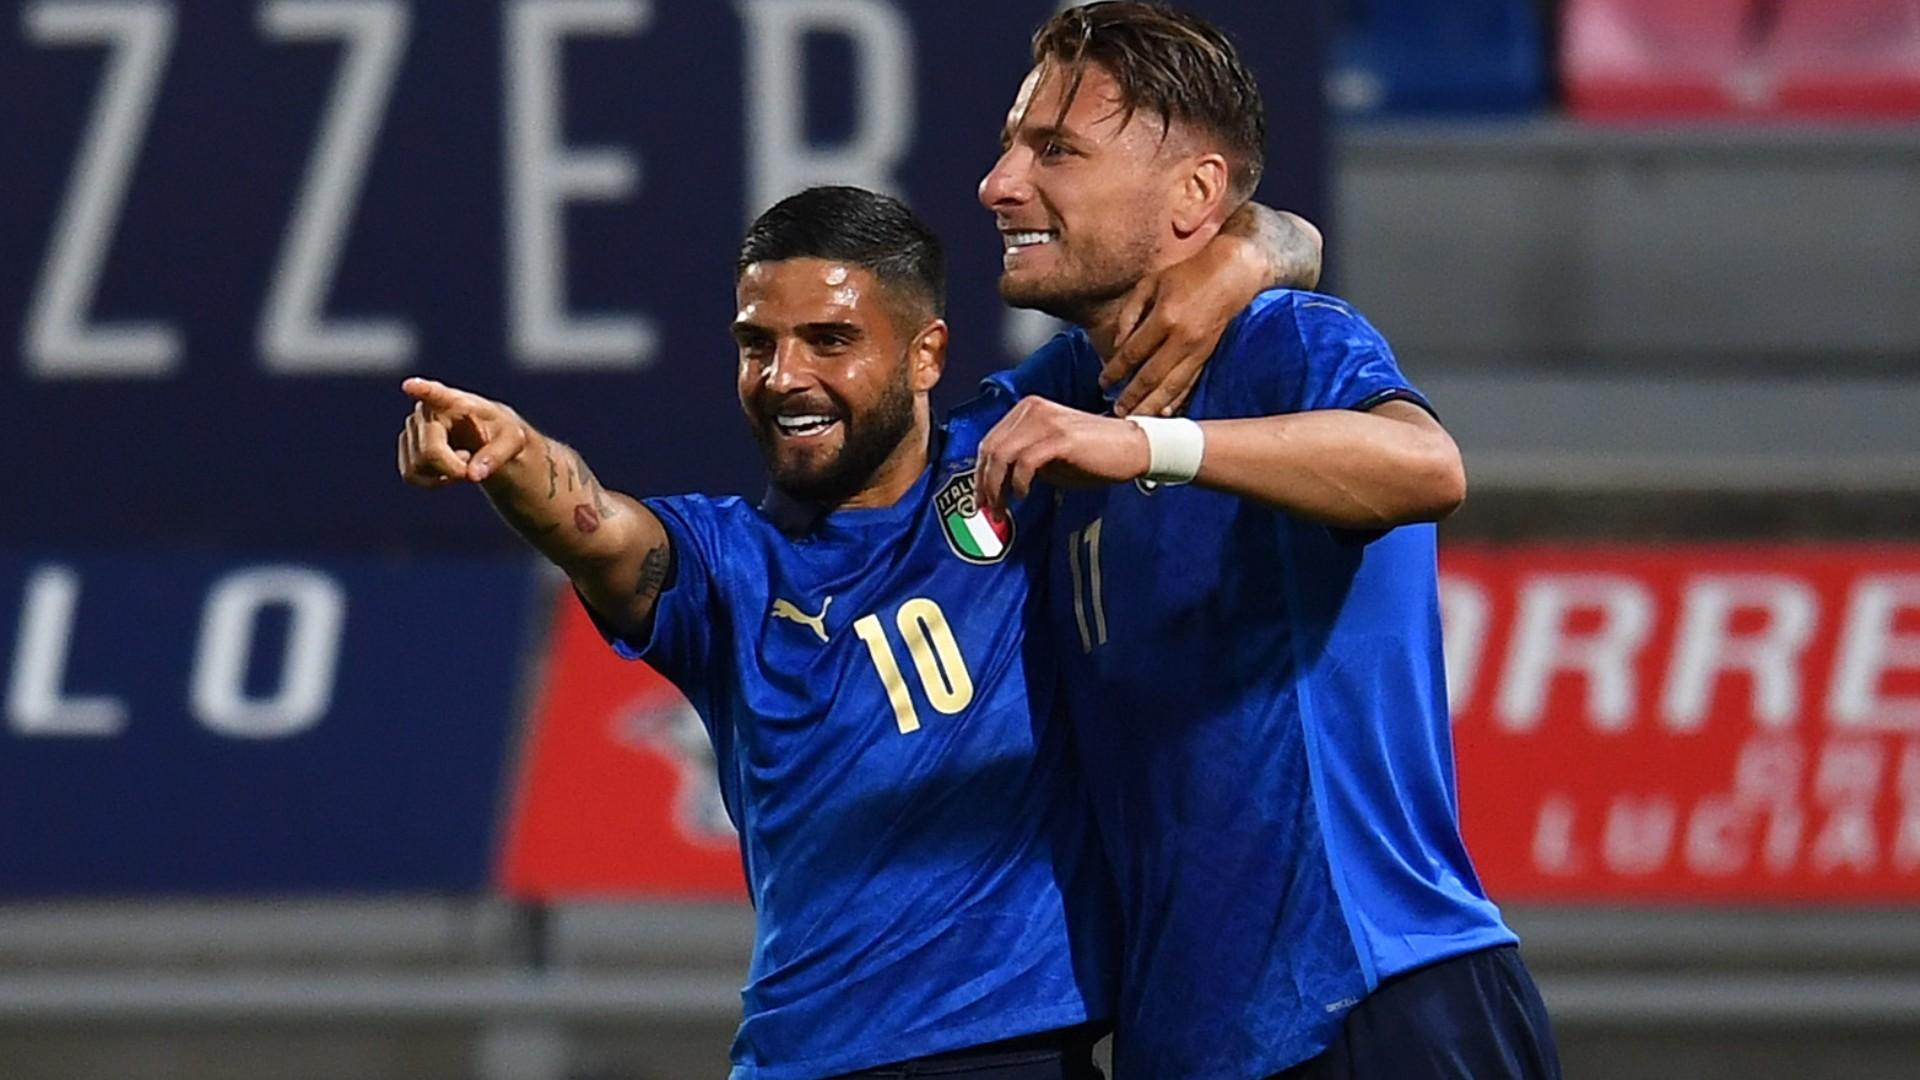 Turkey v Italy Live Commentary & Result, 11/06/2021, European Championship | Goal.com